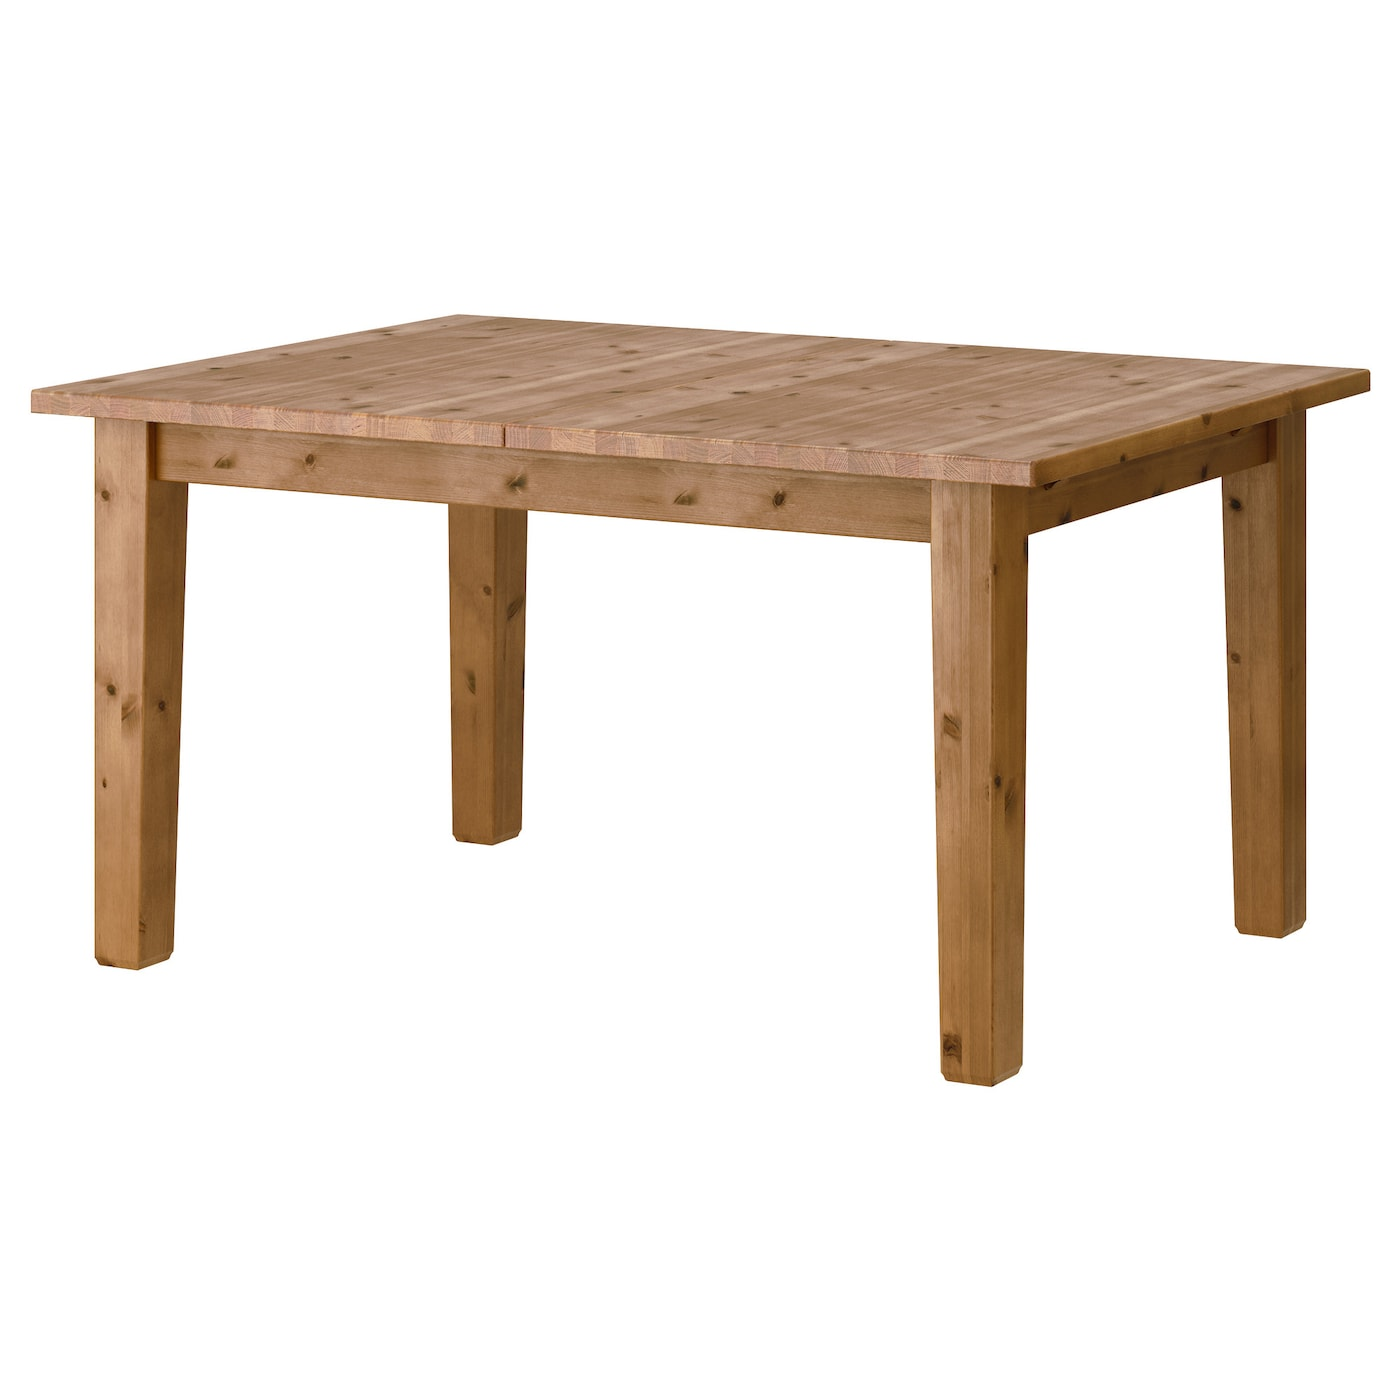 storn s table extensible vernis effet anc 147 204x95 cm ikea. Black Bedroom Furniture Sets. Home Design Ideas